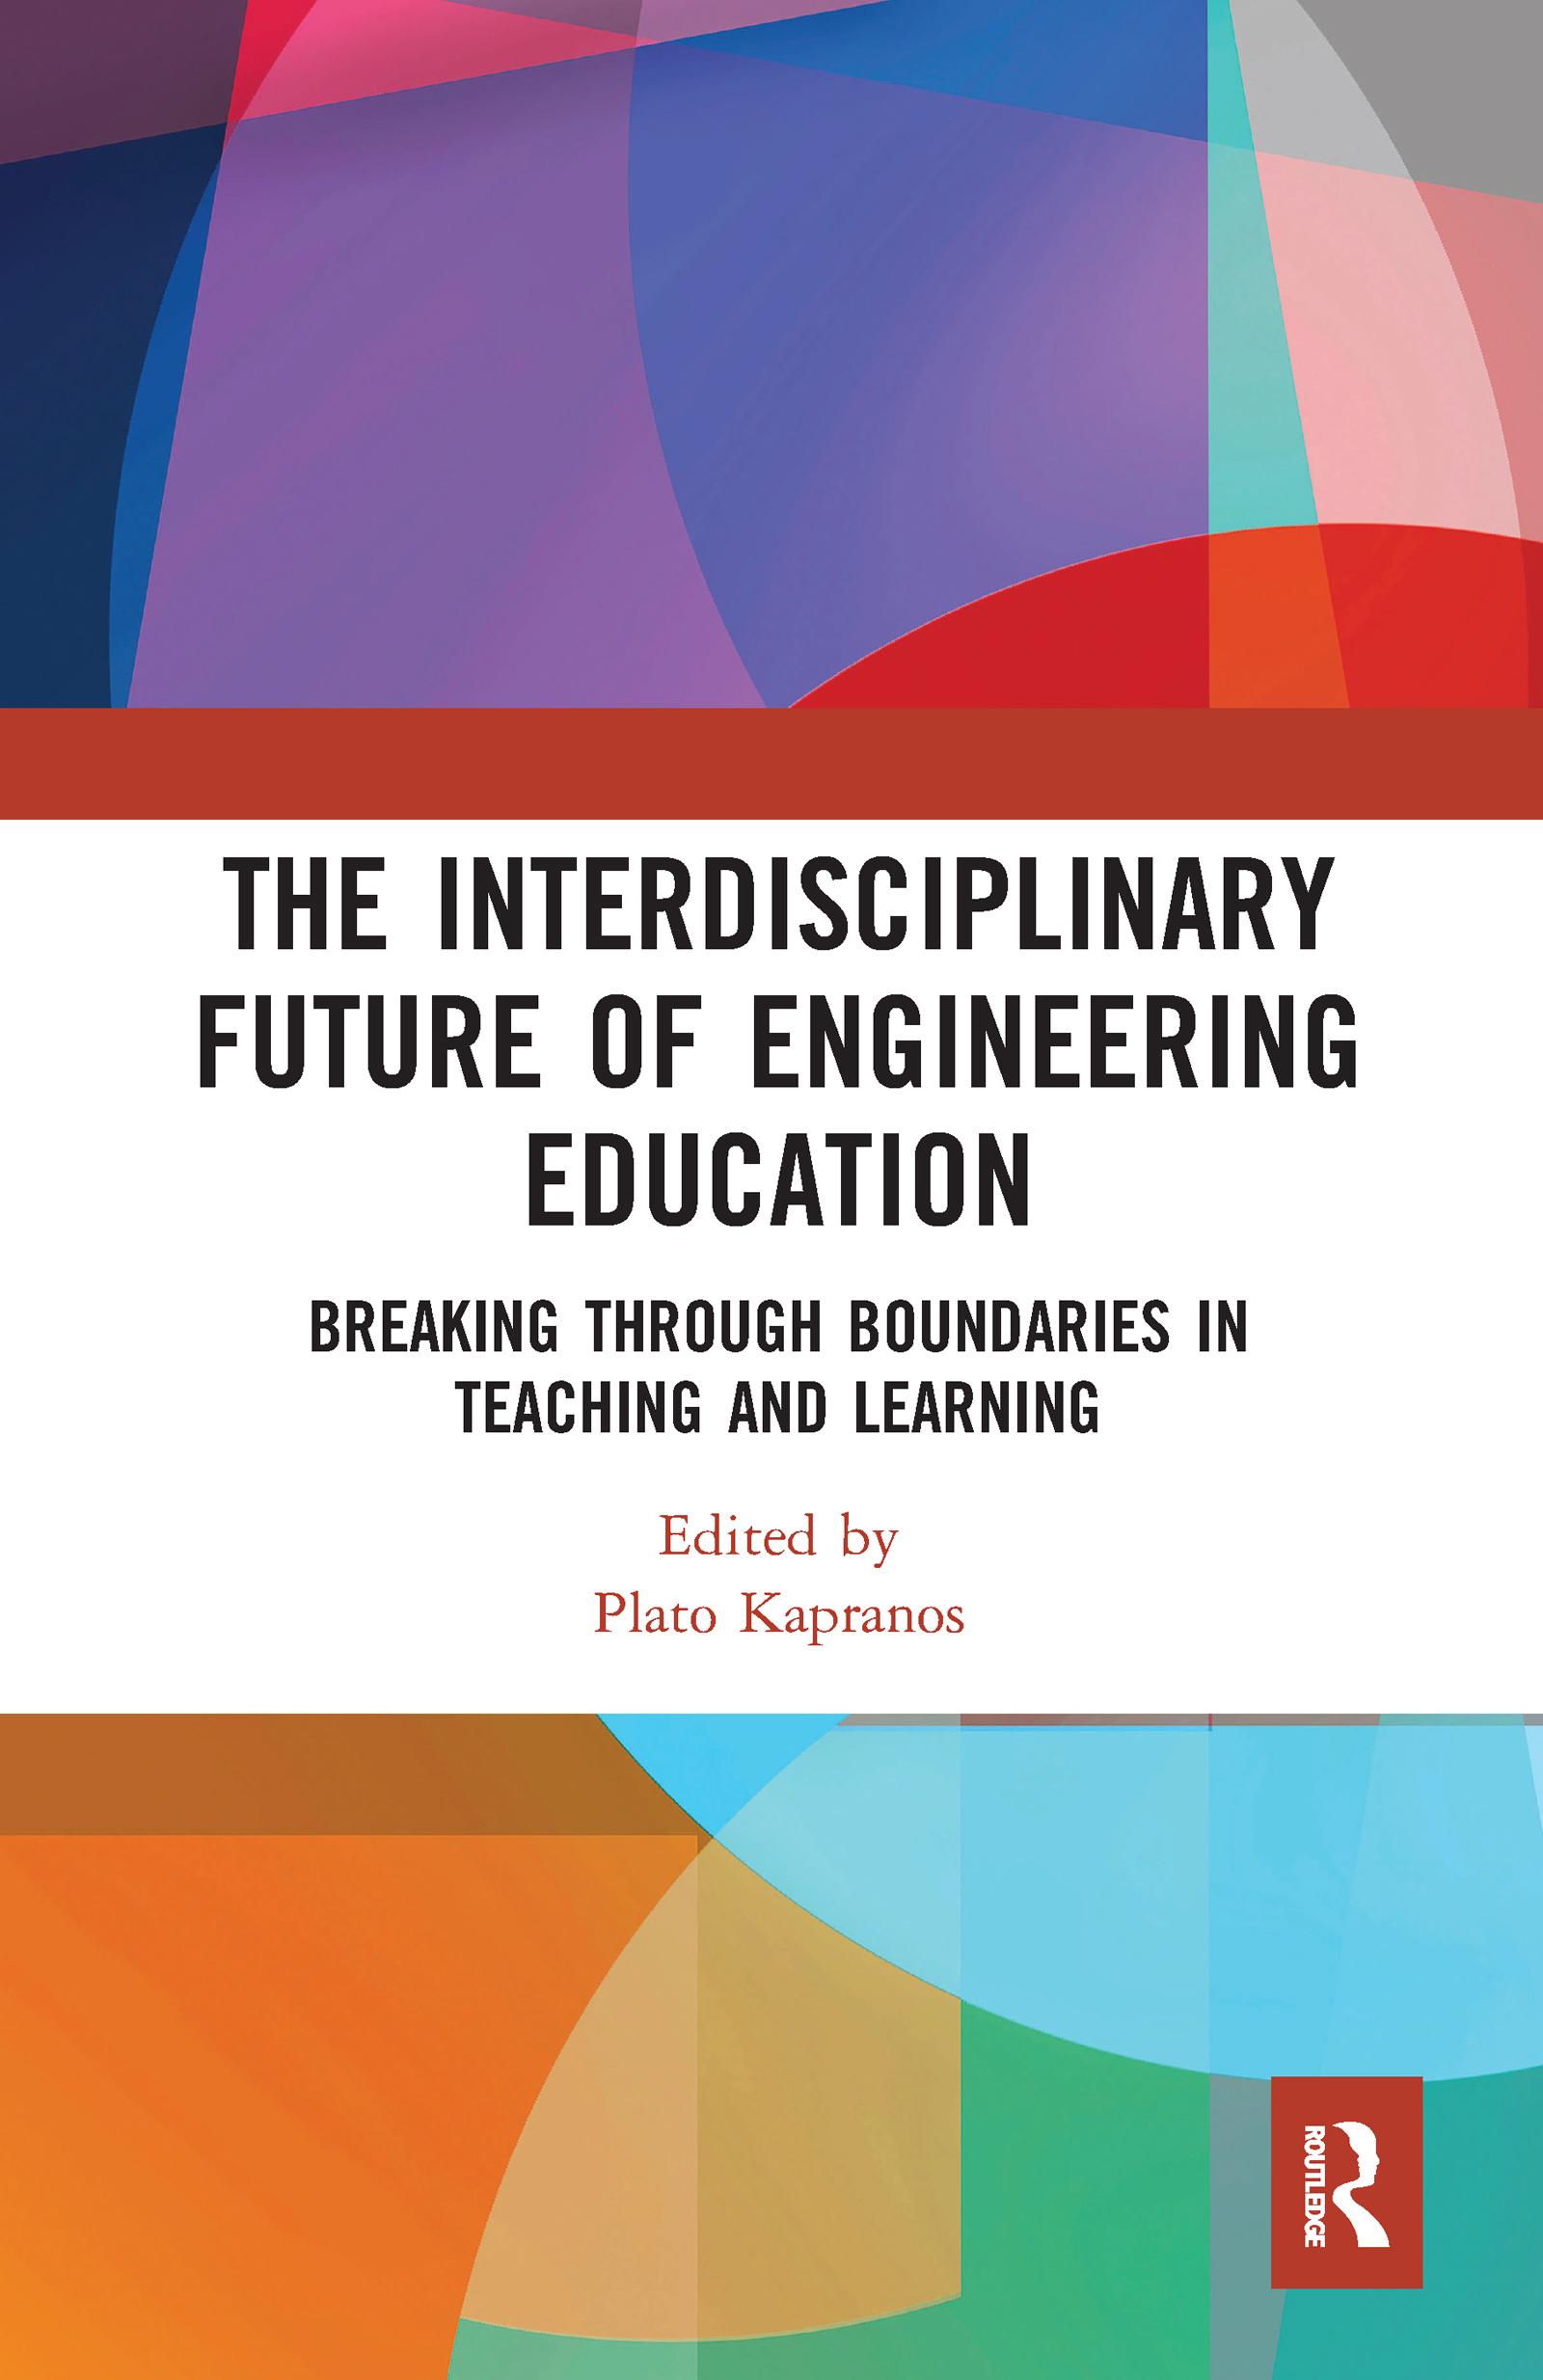 The Interdisciplinary Future of Engineering Education